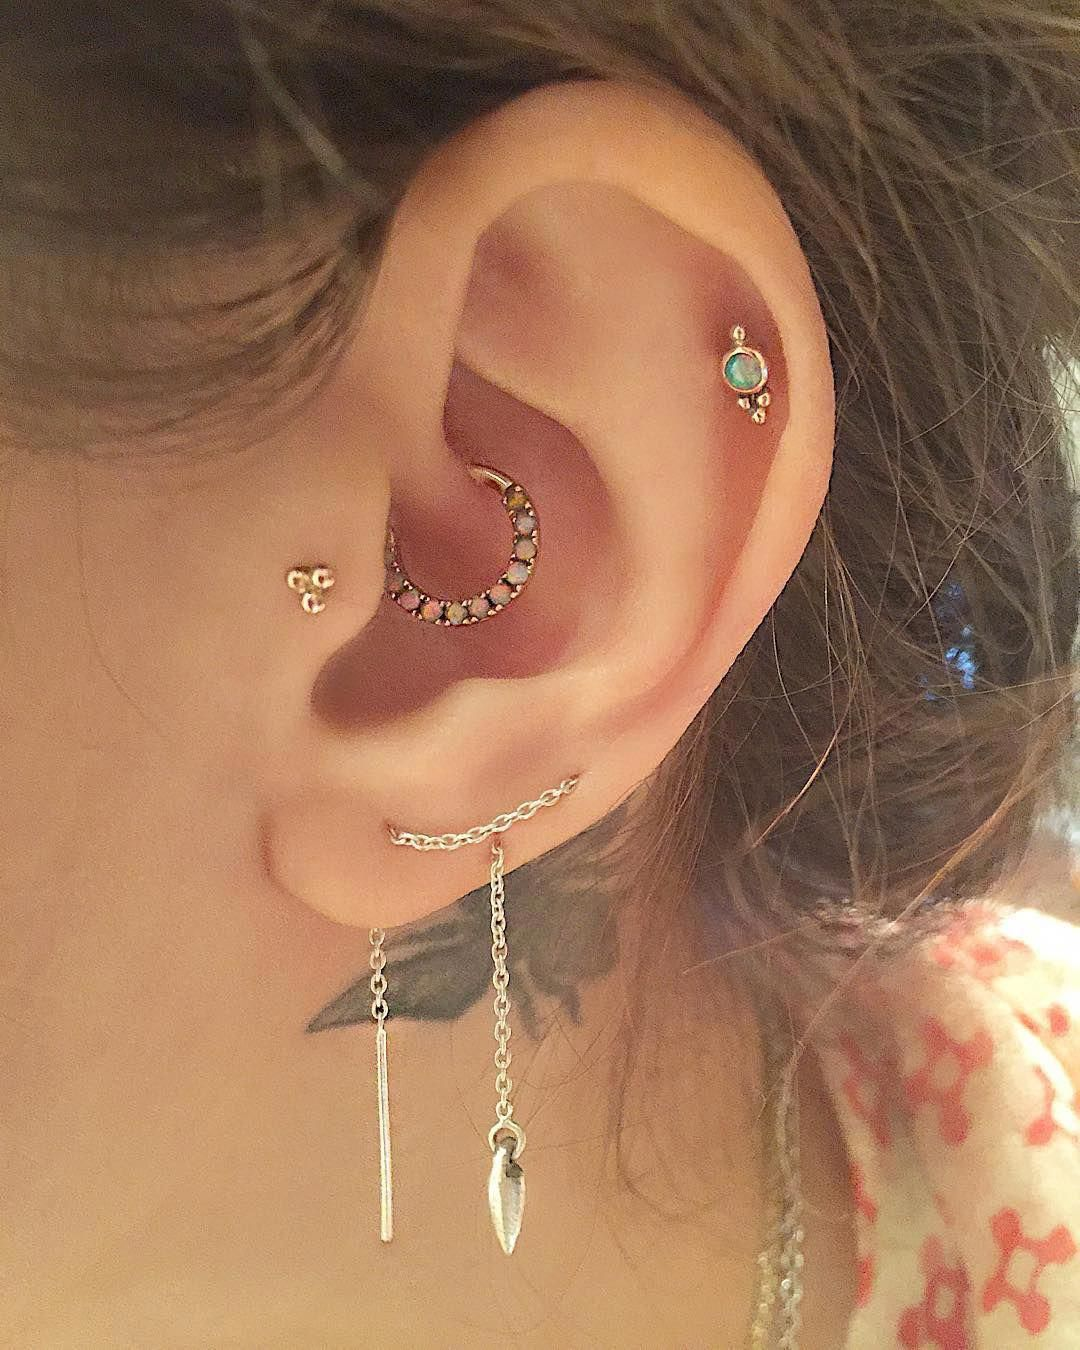 cartilage ear piercing earrings: Ask your piercer for ...